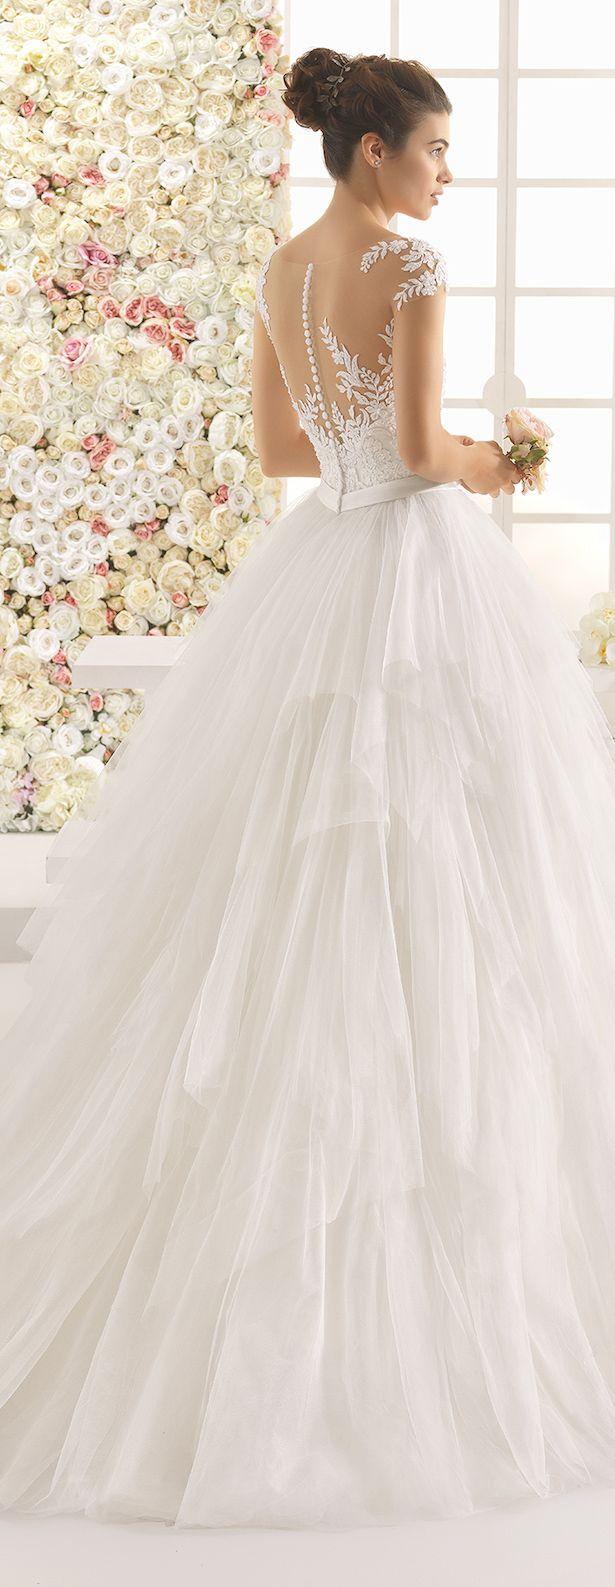 Wedding-Dresses-0540